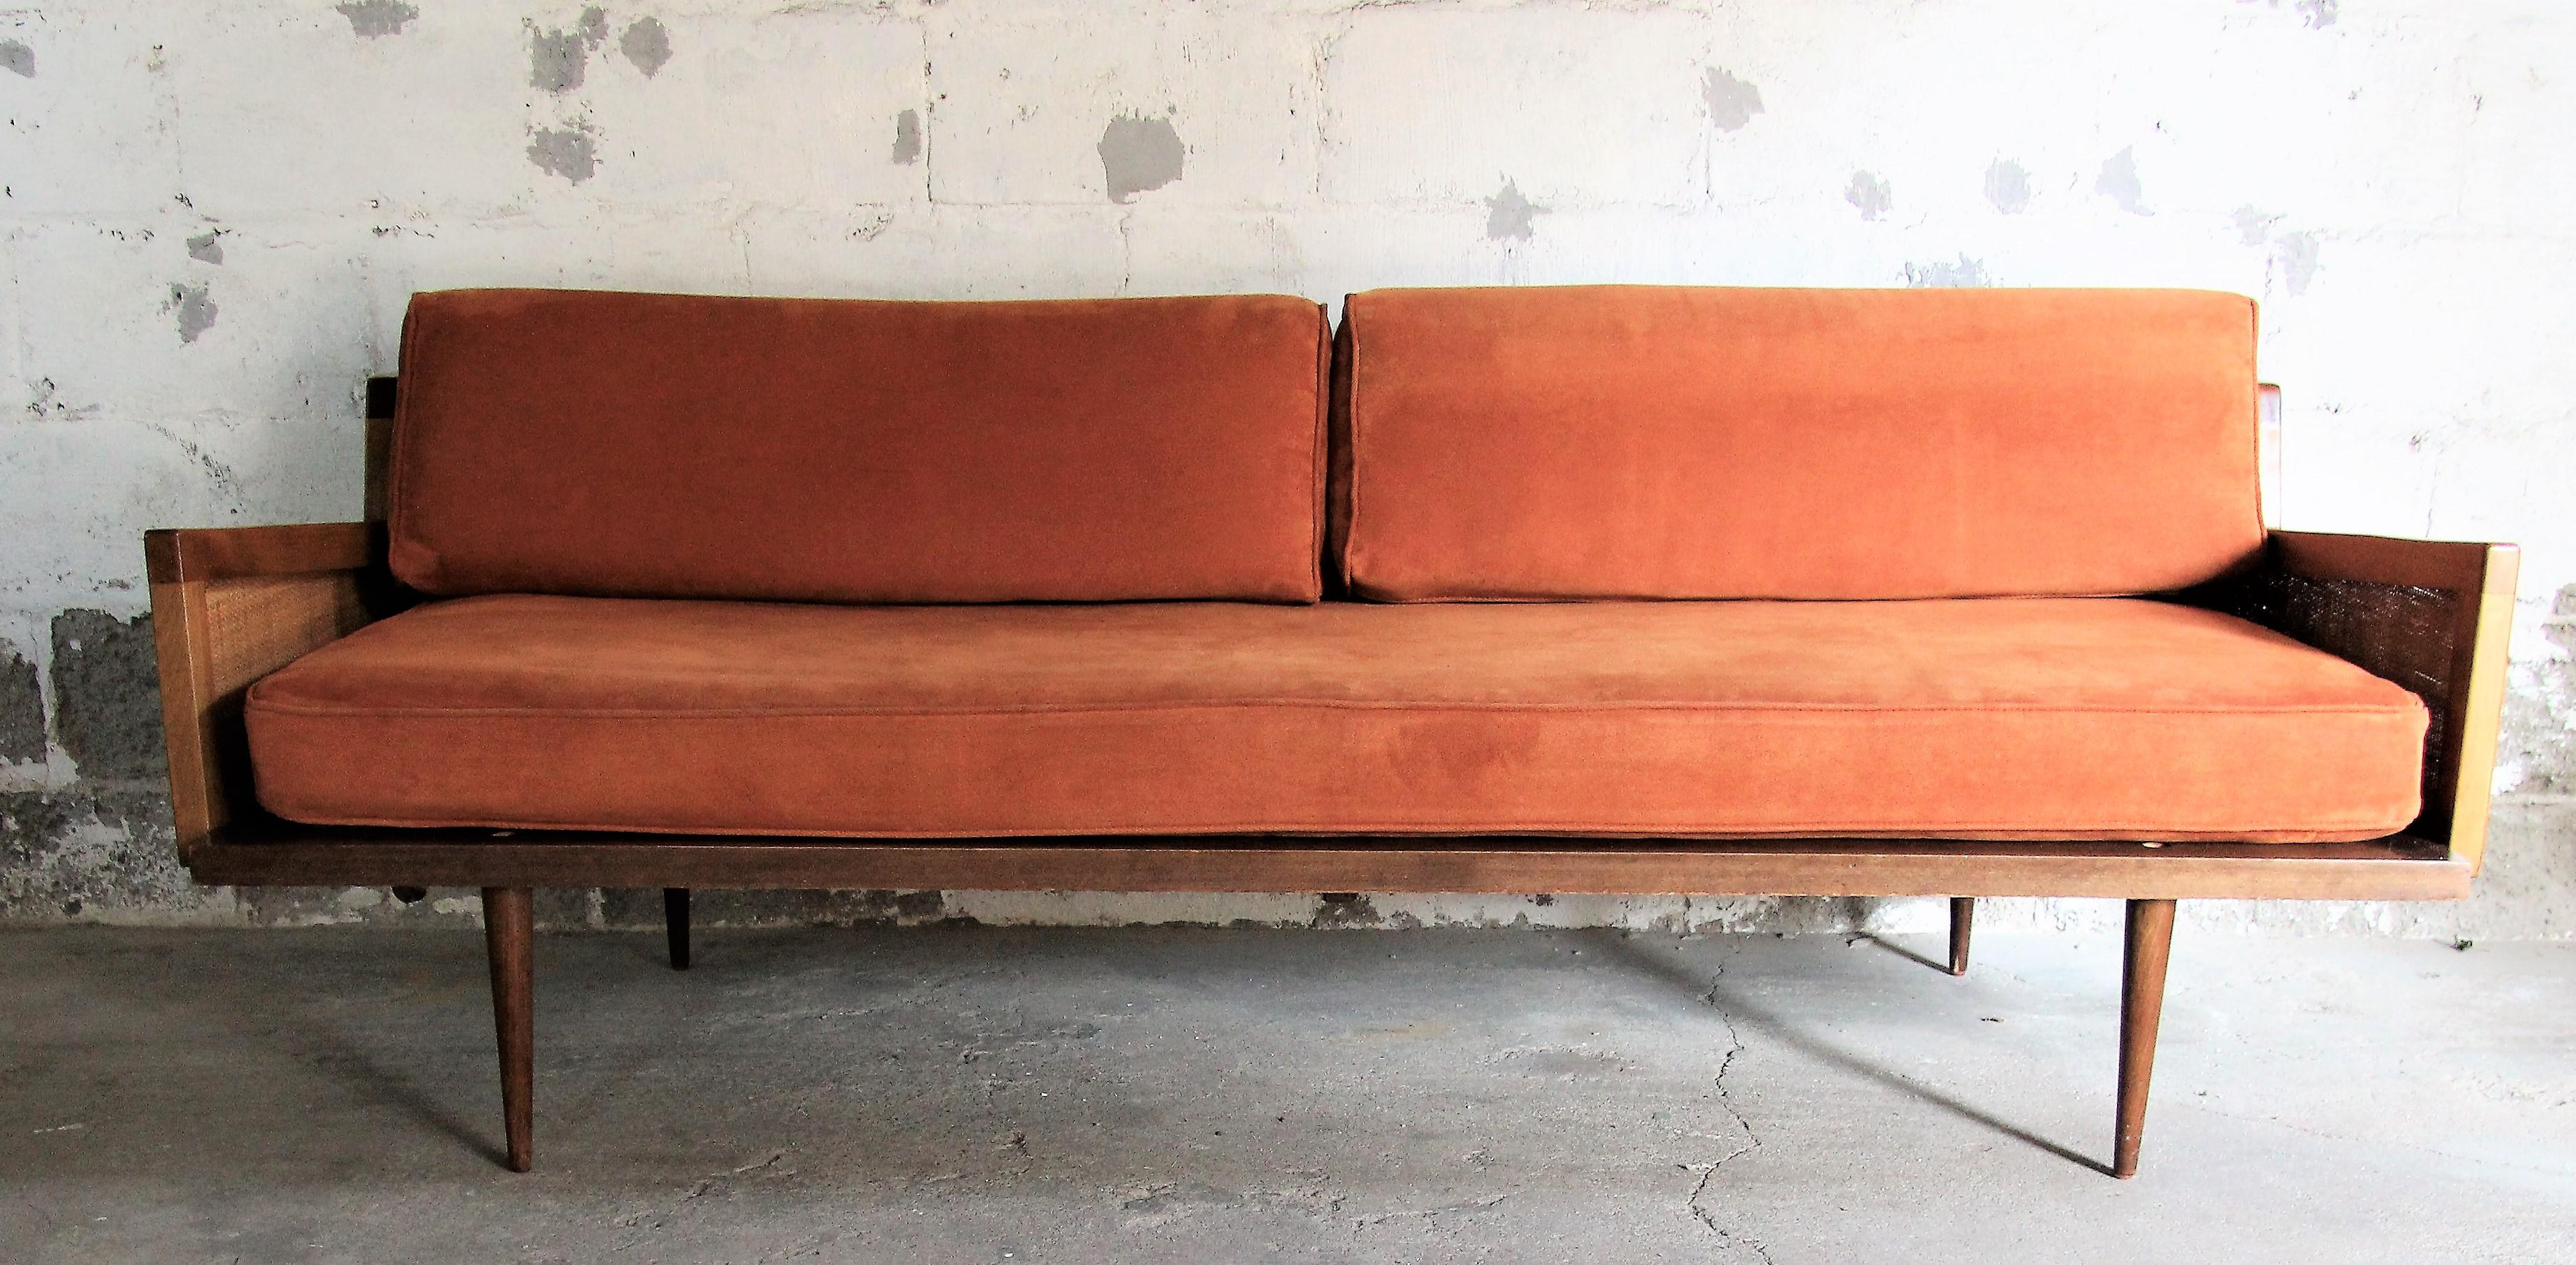 Daybed danish  Mid-Century Modern Danish Daybed | Chairish